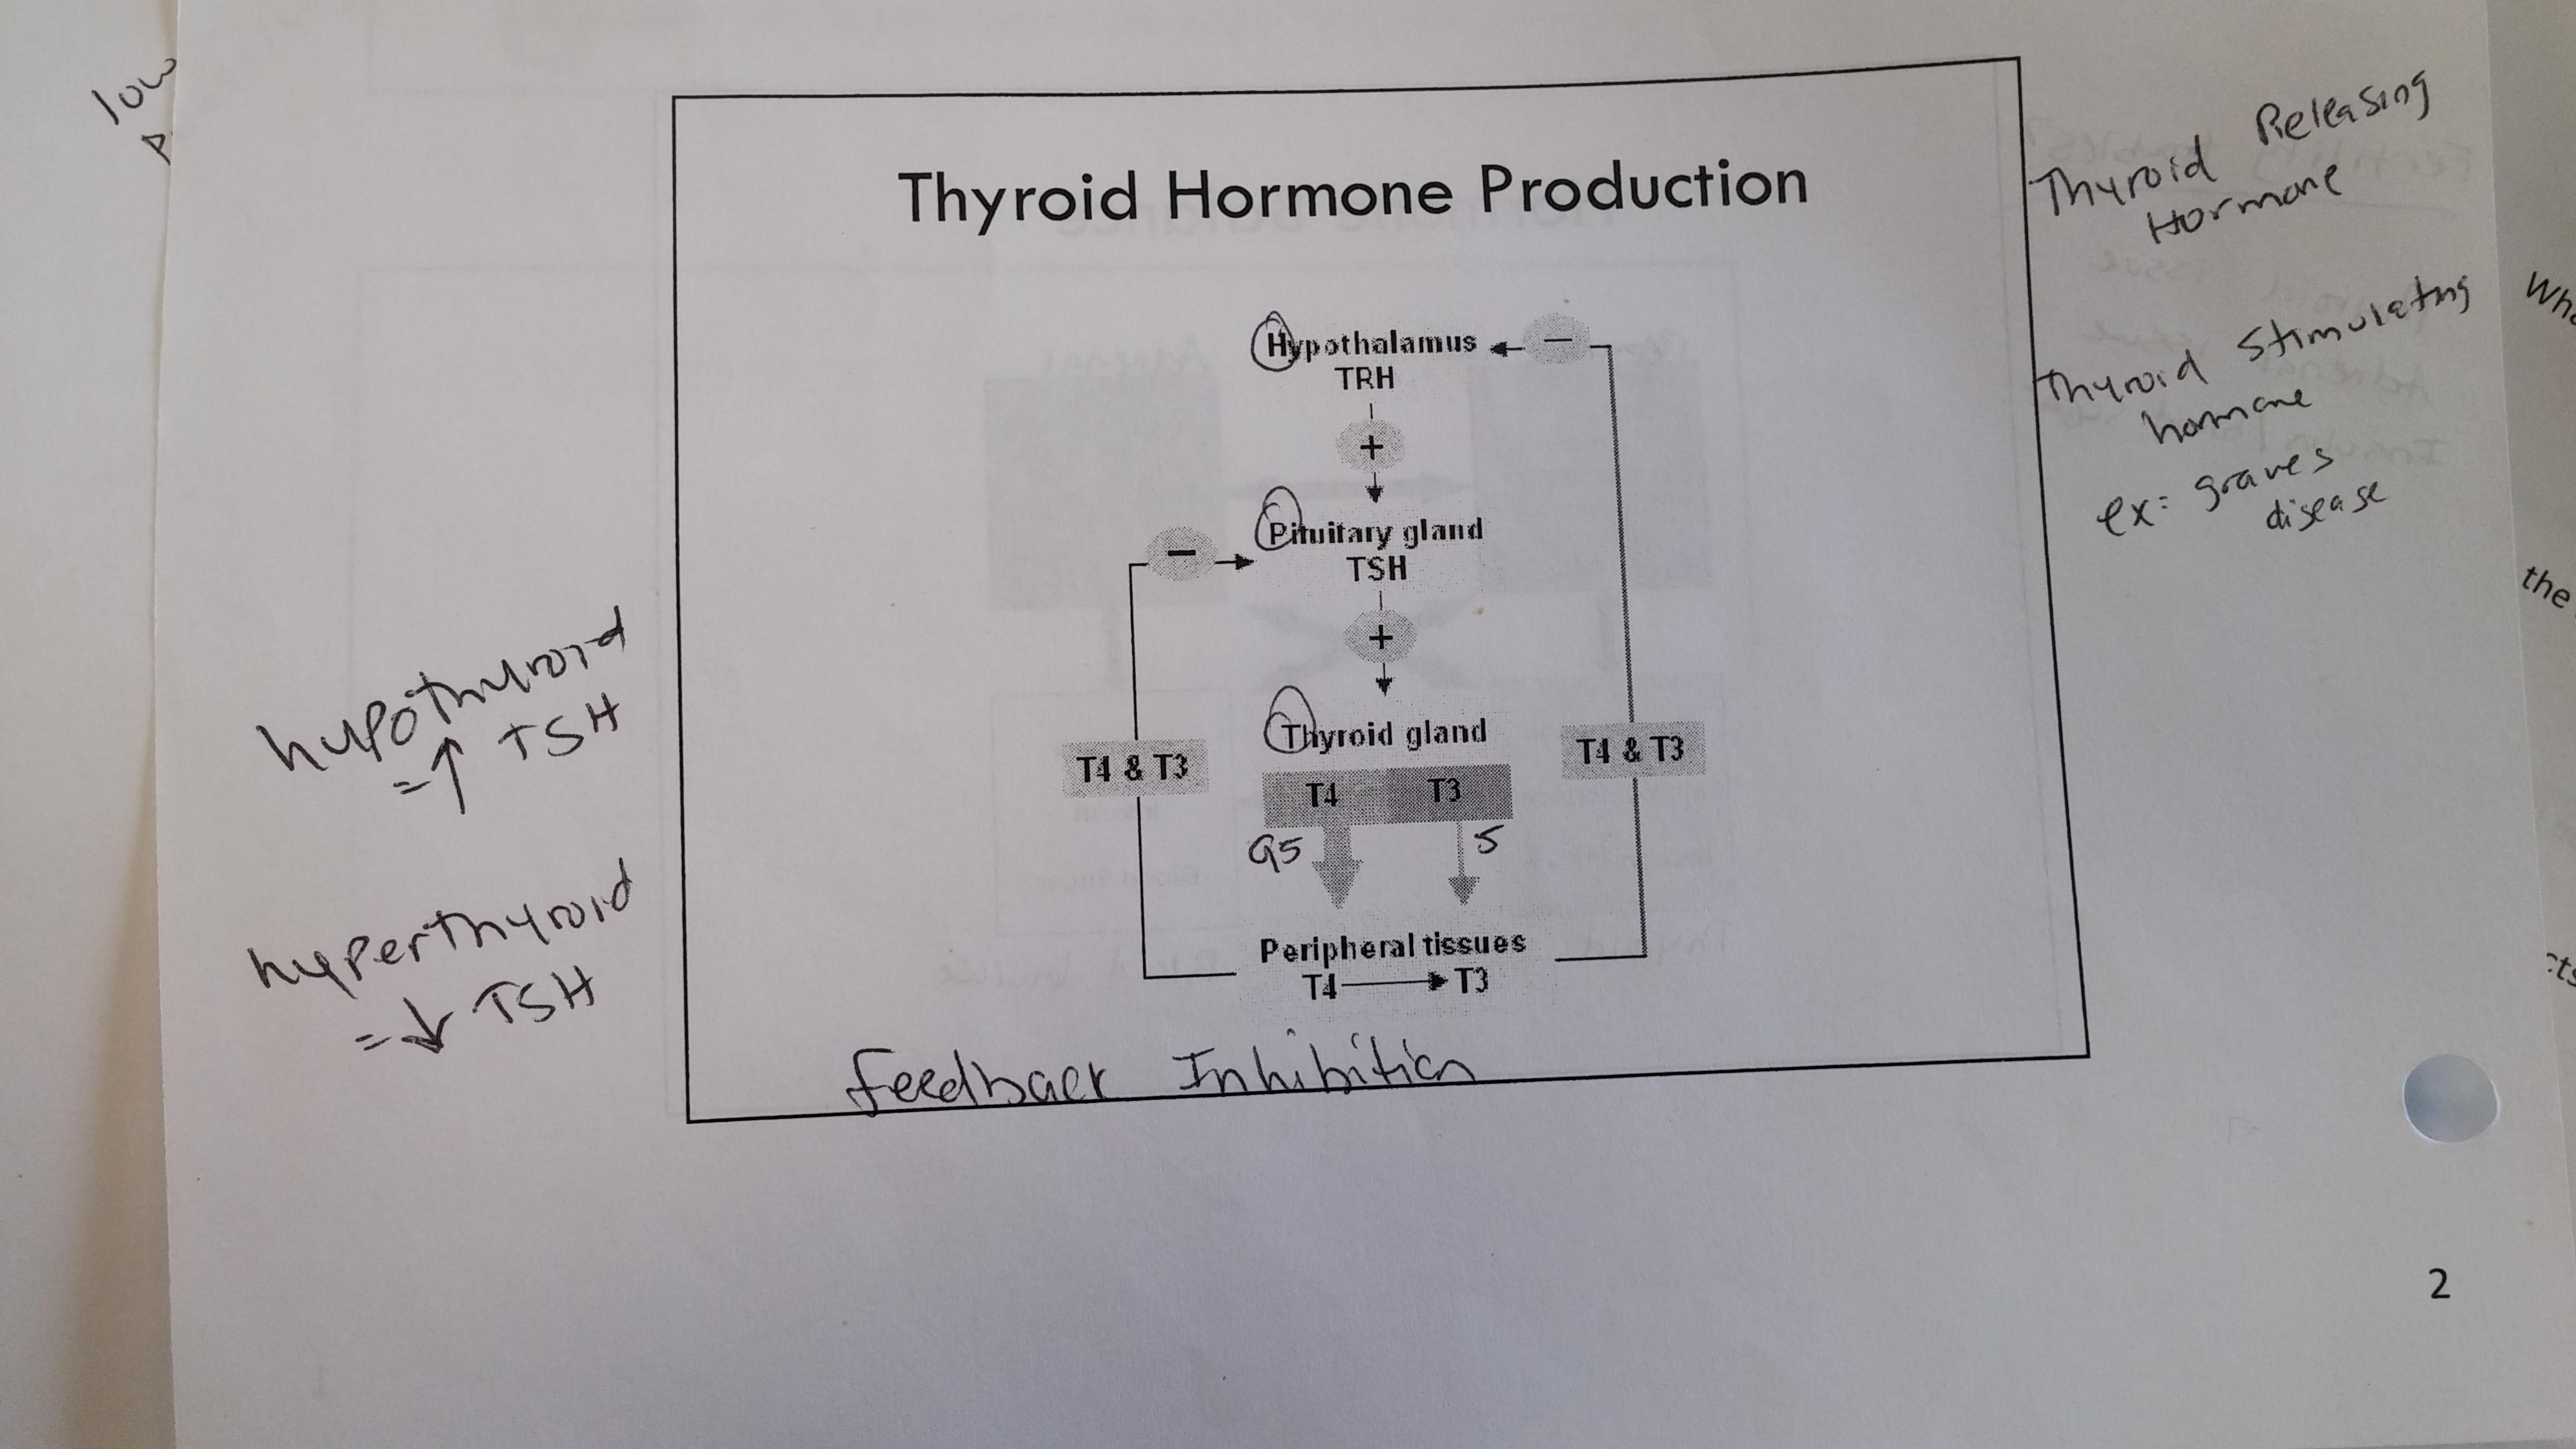 Endocrine system pharmacology flashcards memorang negative feedback loopg hypothalamus secretes trhpituitary gland releases tshthyroid gland ccuart Images